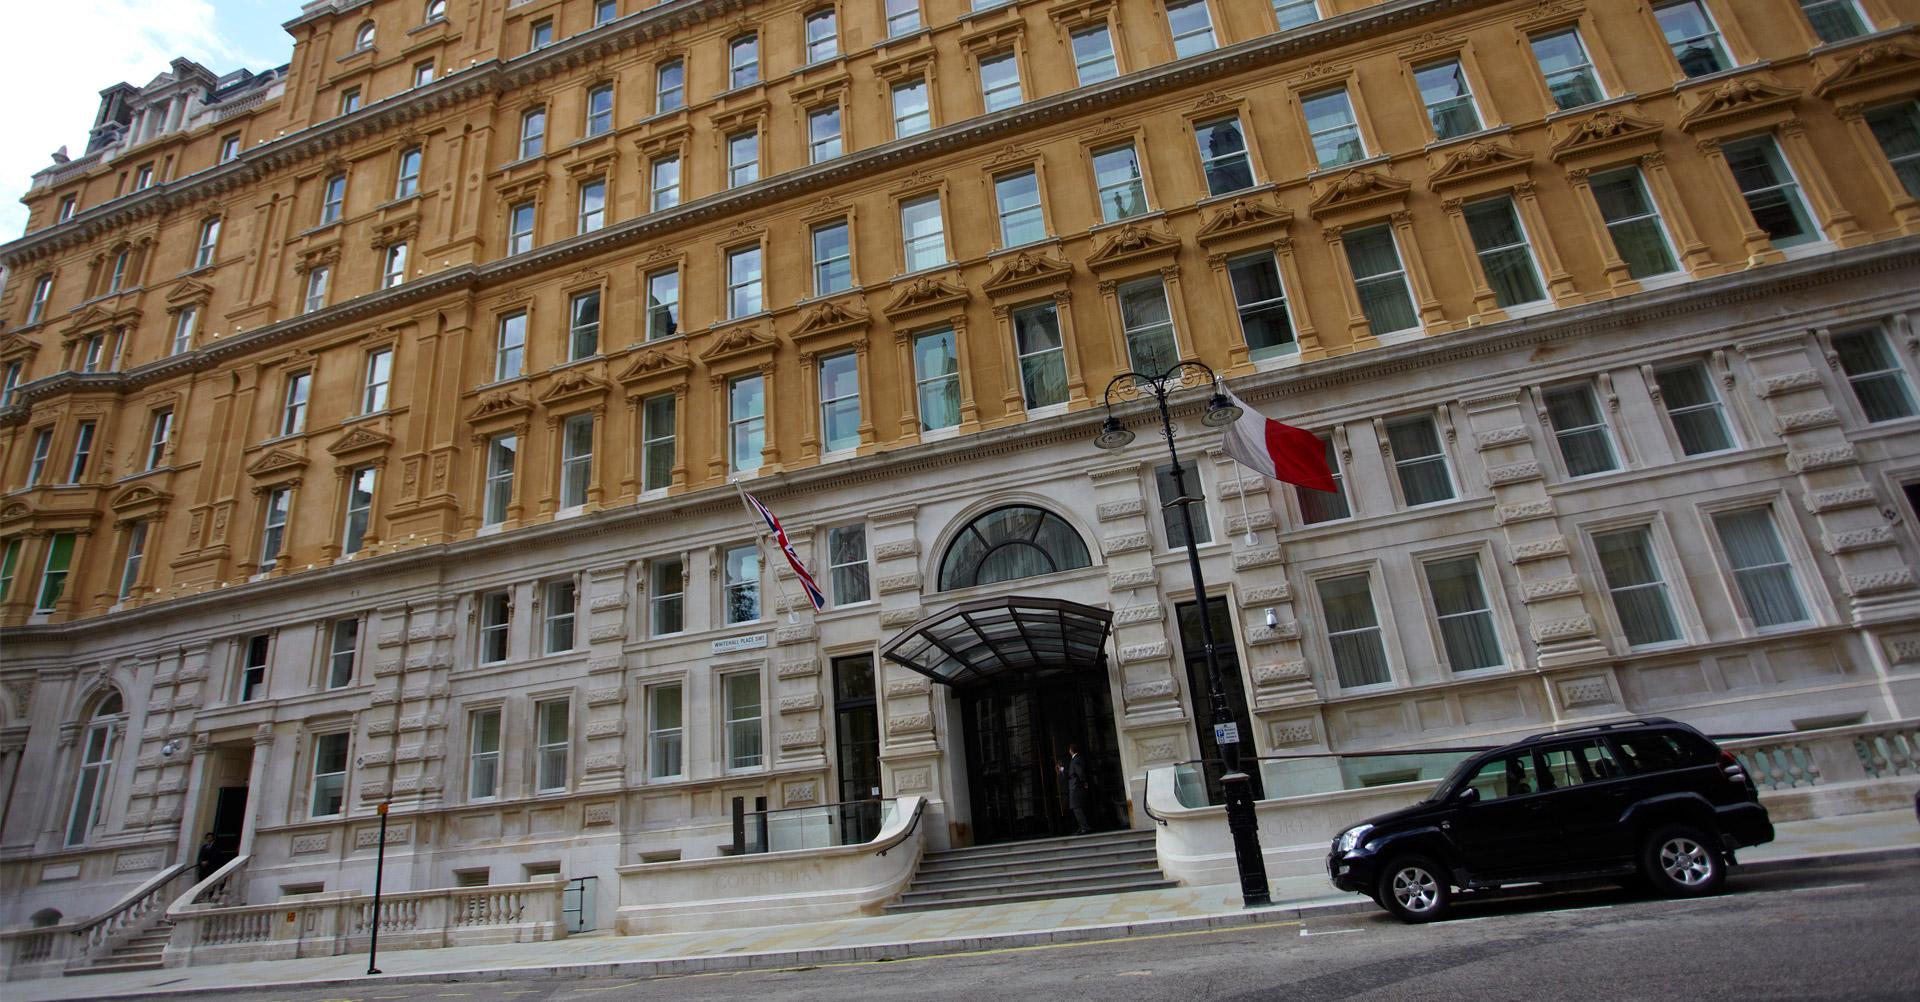 corinthia-hotel-london-14